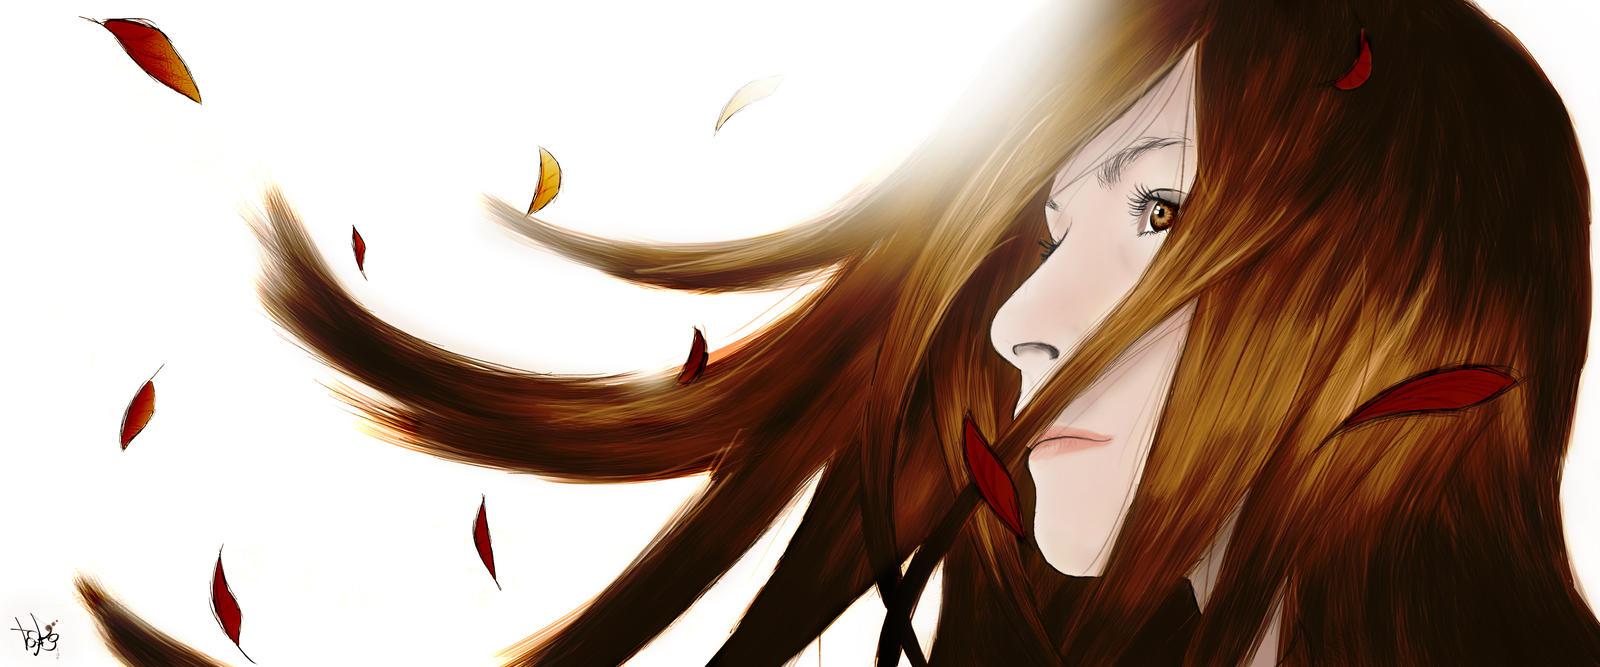 Autumn Girl by Toyboj